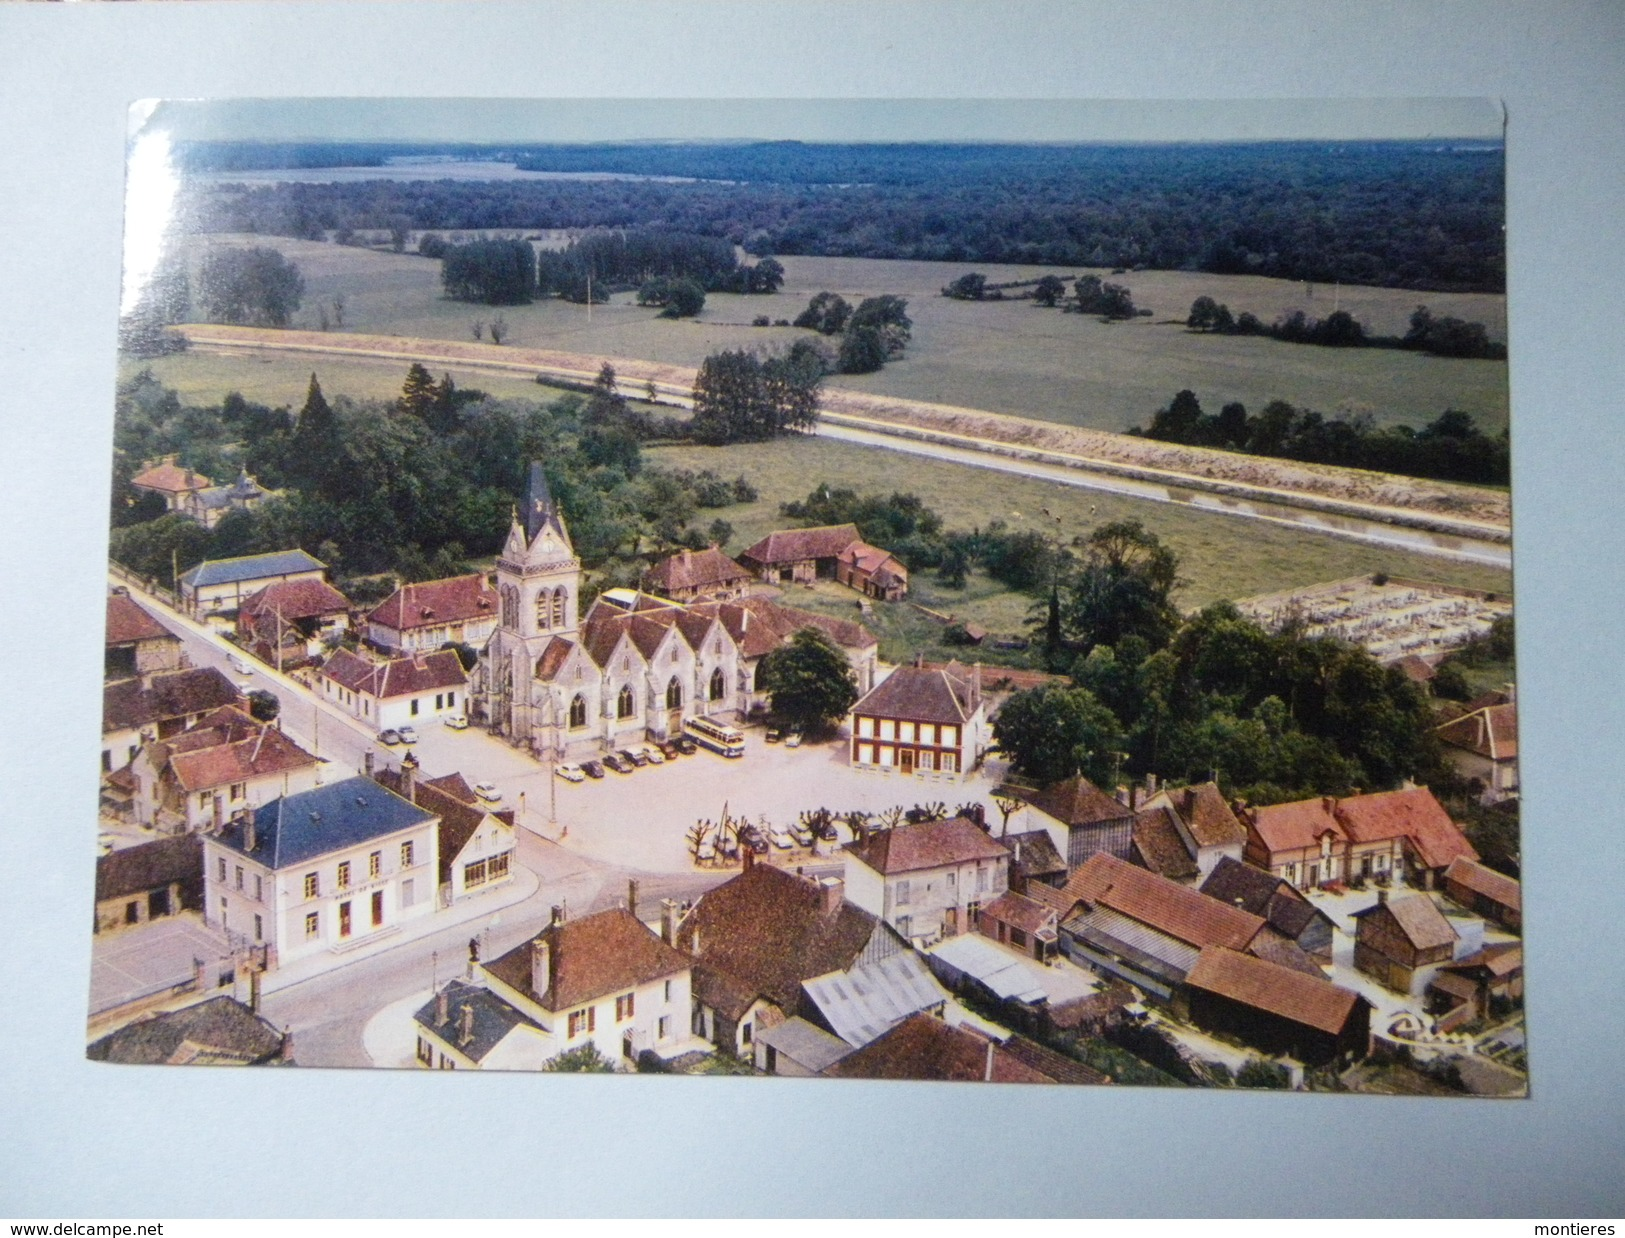 CPSM 10 AUBE - LUSIGNY SUR BARSE VUE AÉRIENNE - Troyes